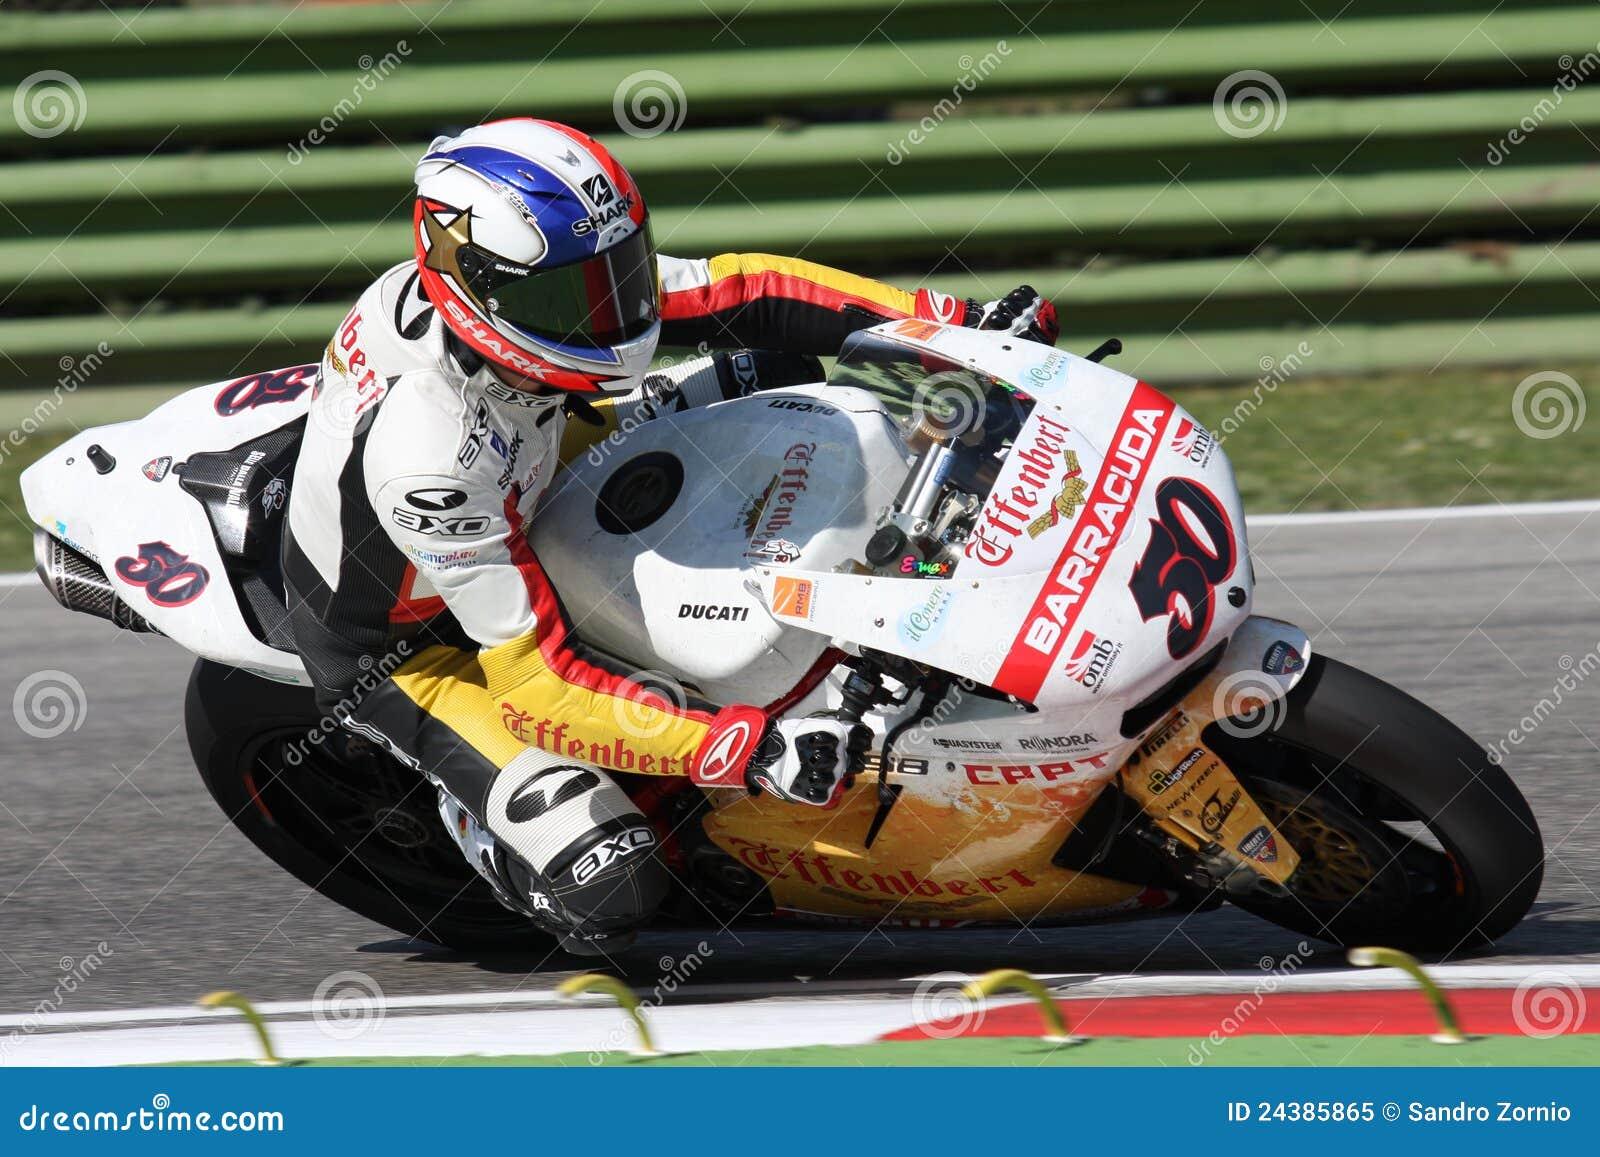 Sylvain Guintoli - Ducati1098R - liberté d Effenbert